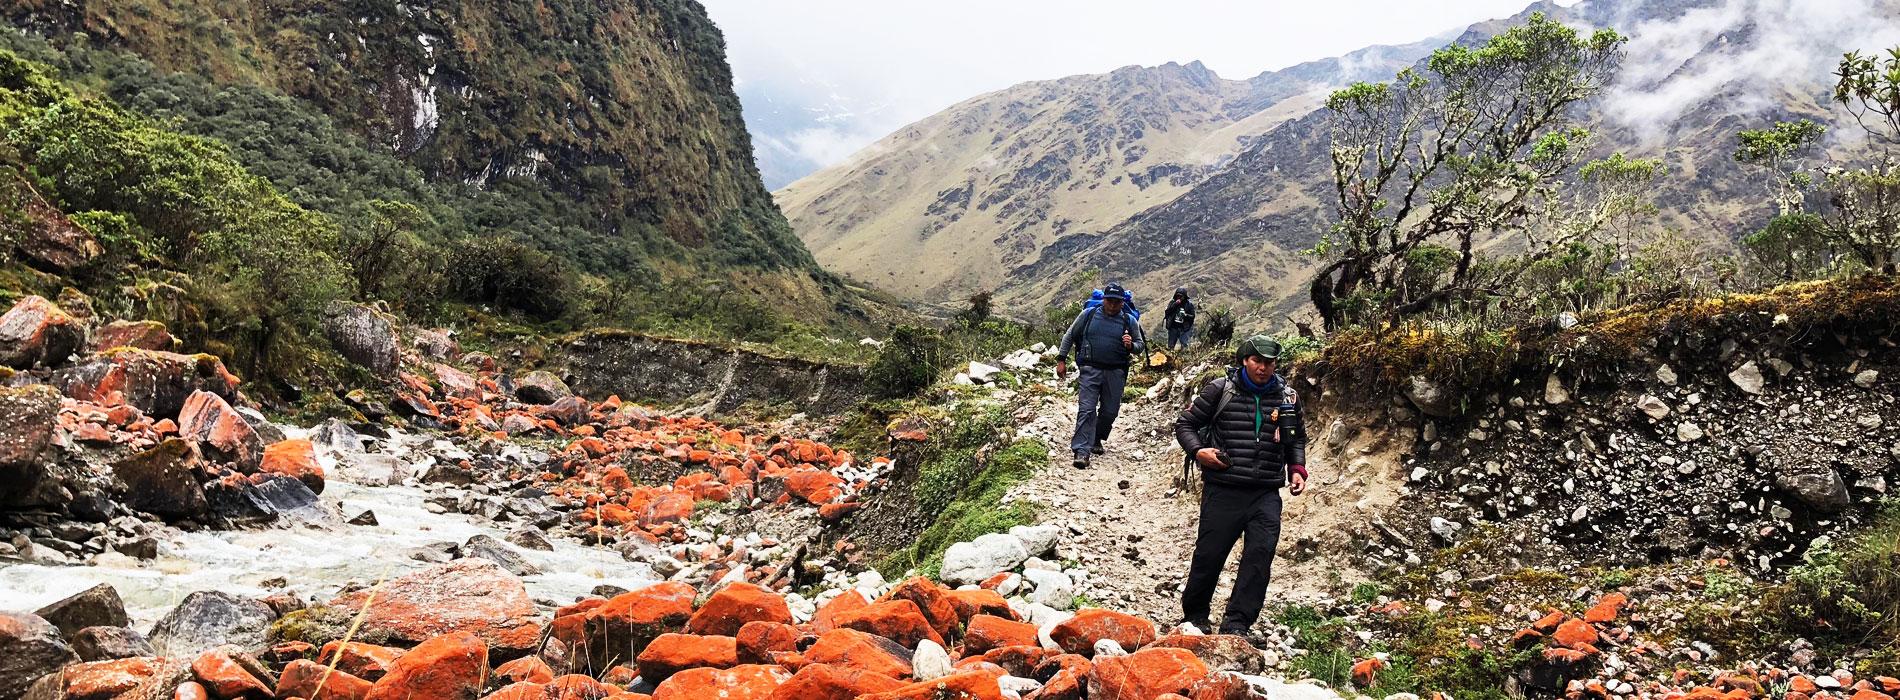 Palcay Trek to Machu Picchu 5D/4N - Action Peru Treks